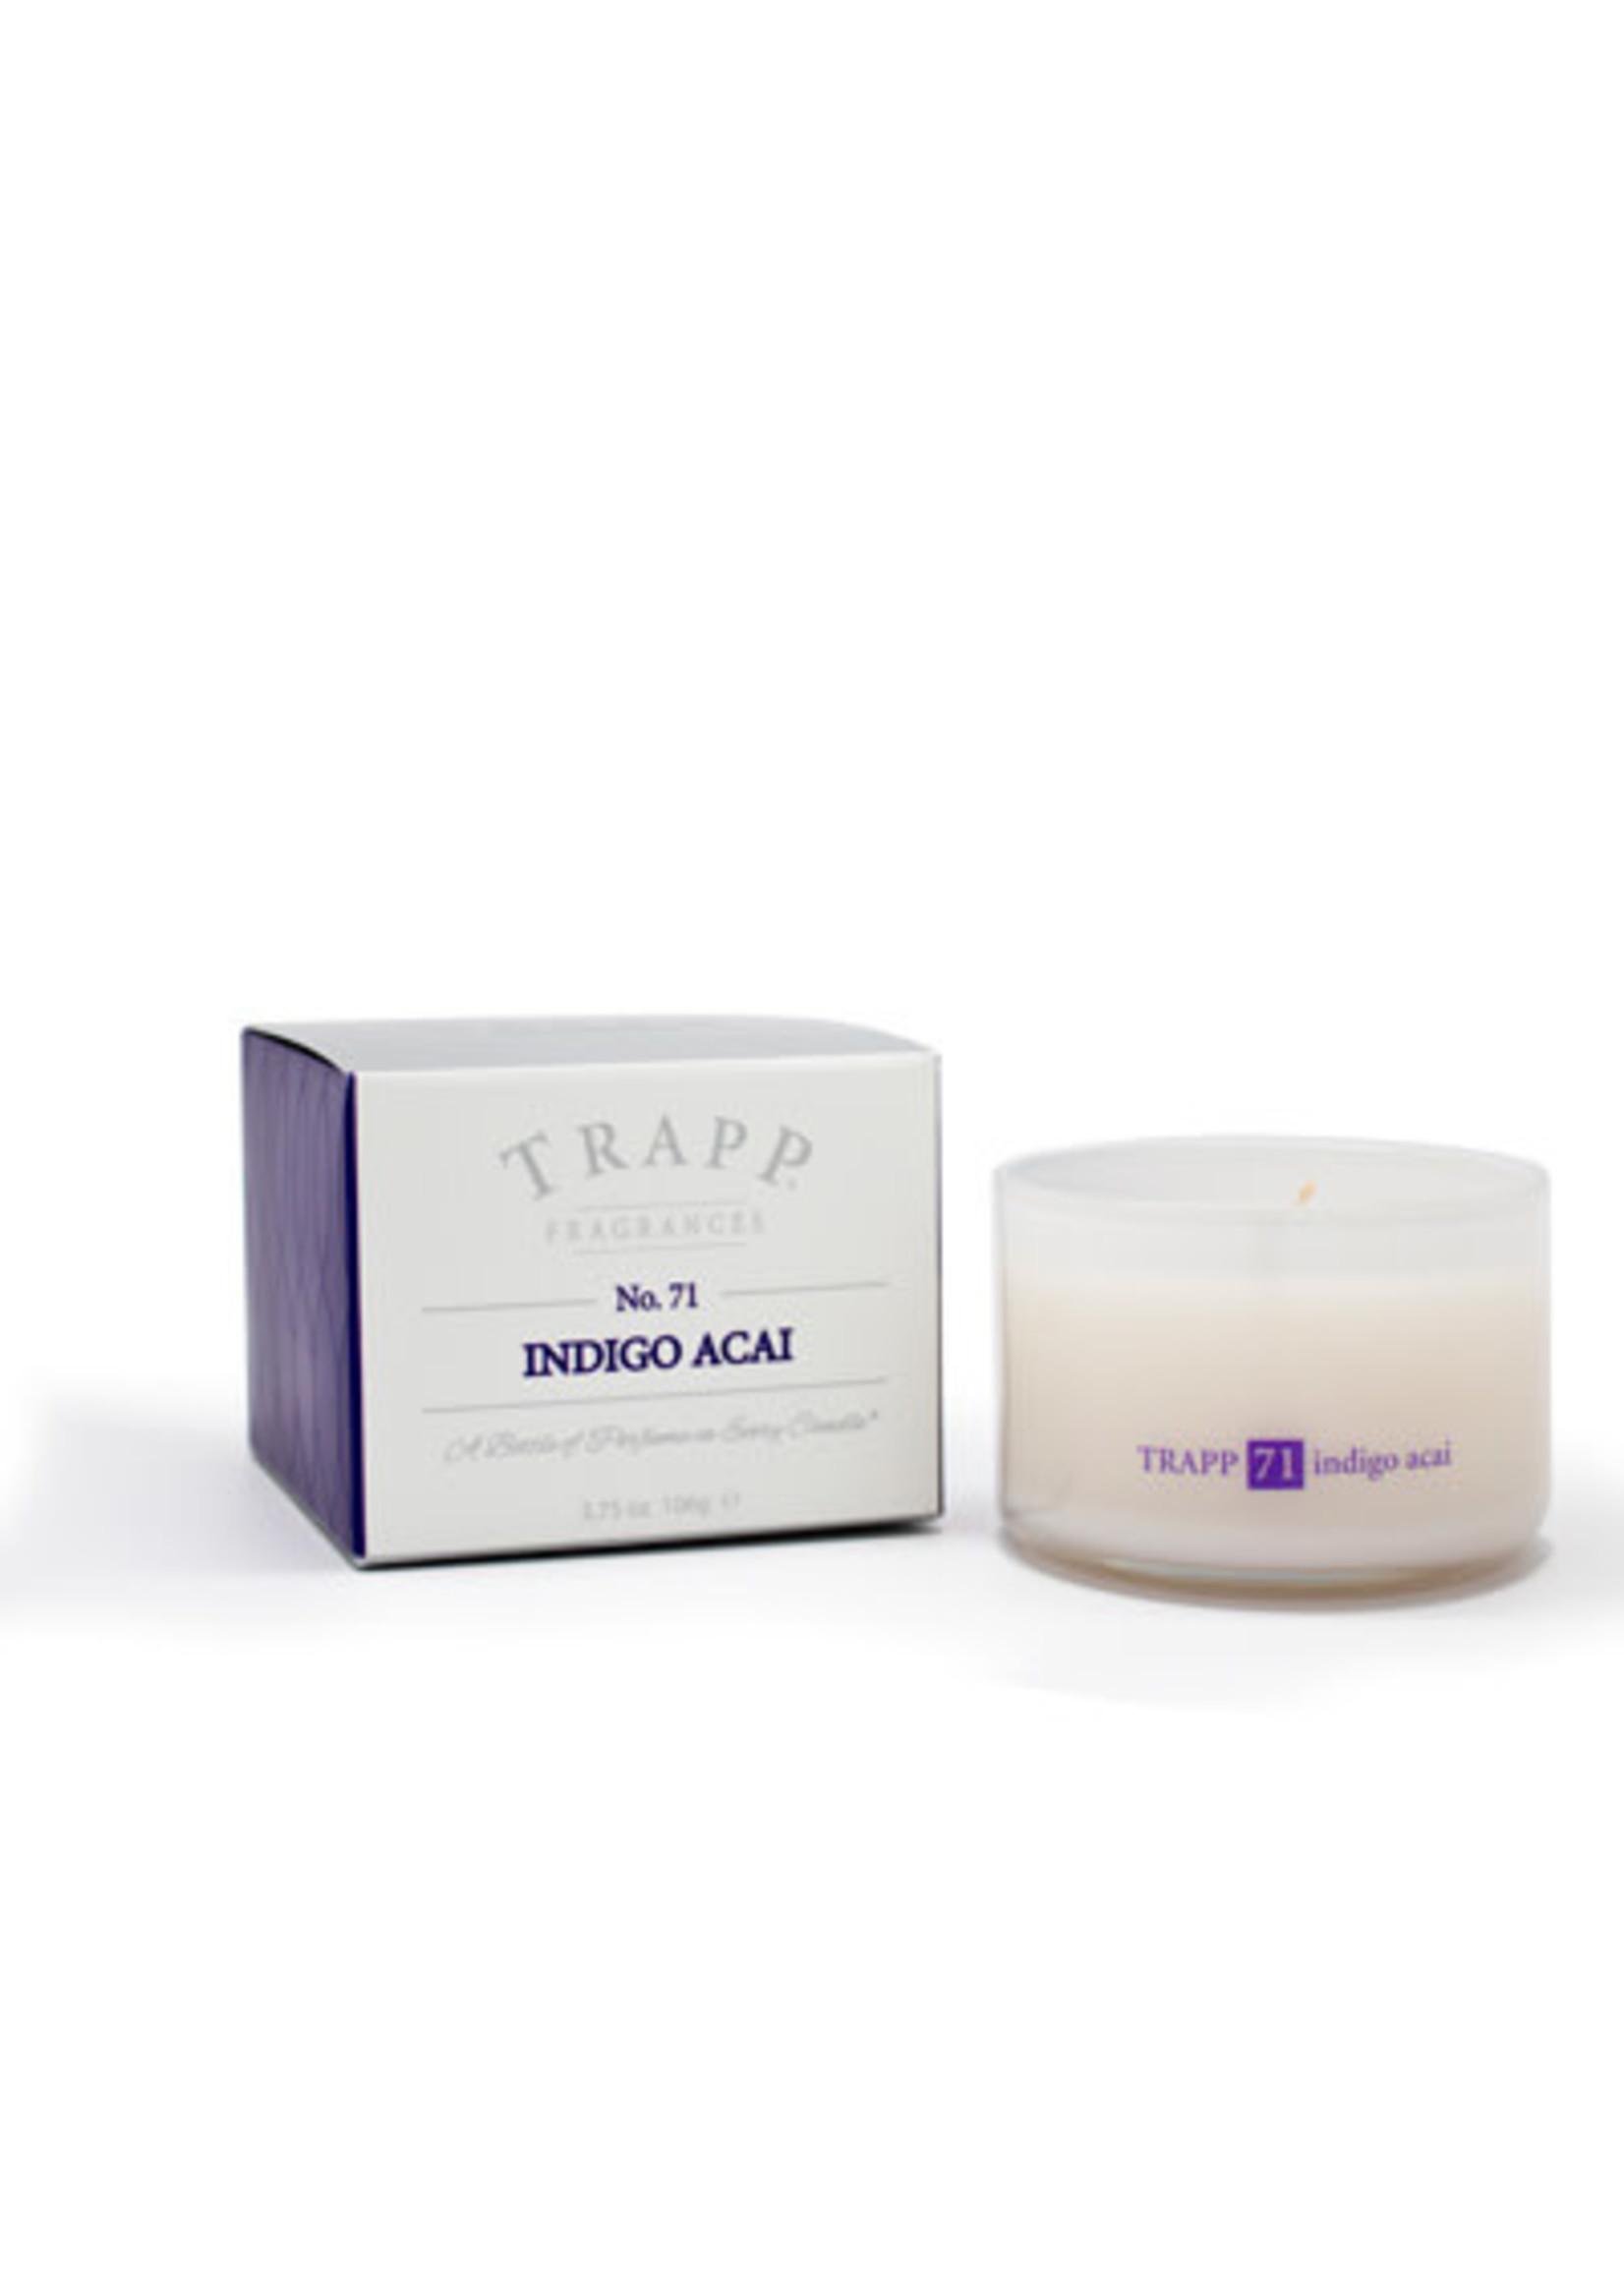 Trapp Candles Ambiance Collection - No. 71 Indigo Acai - 3.75 oz. Poured Candle